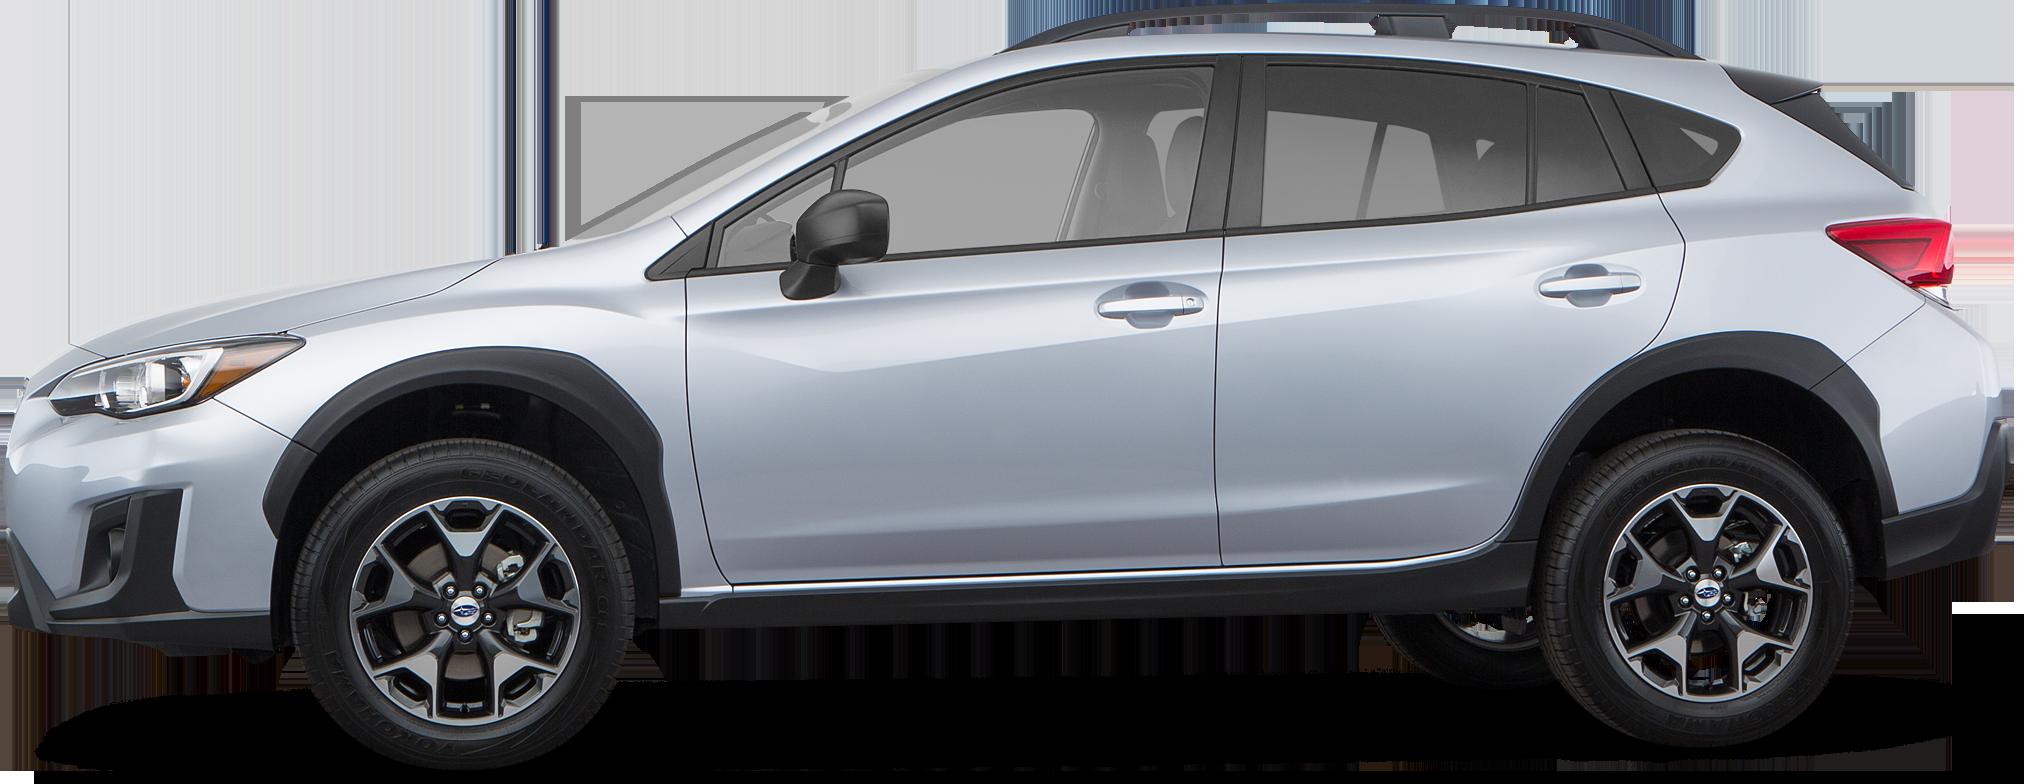 2019 Subaru Crosstrek SUV 2.0i